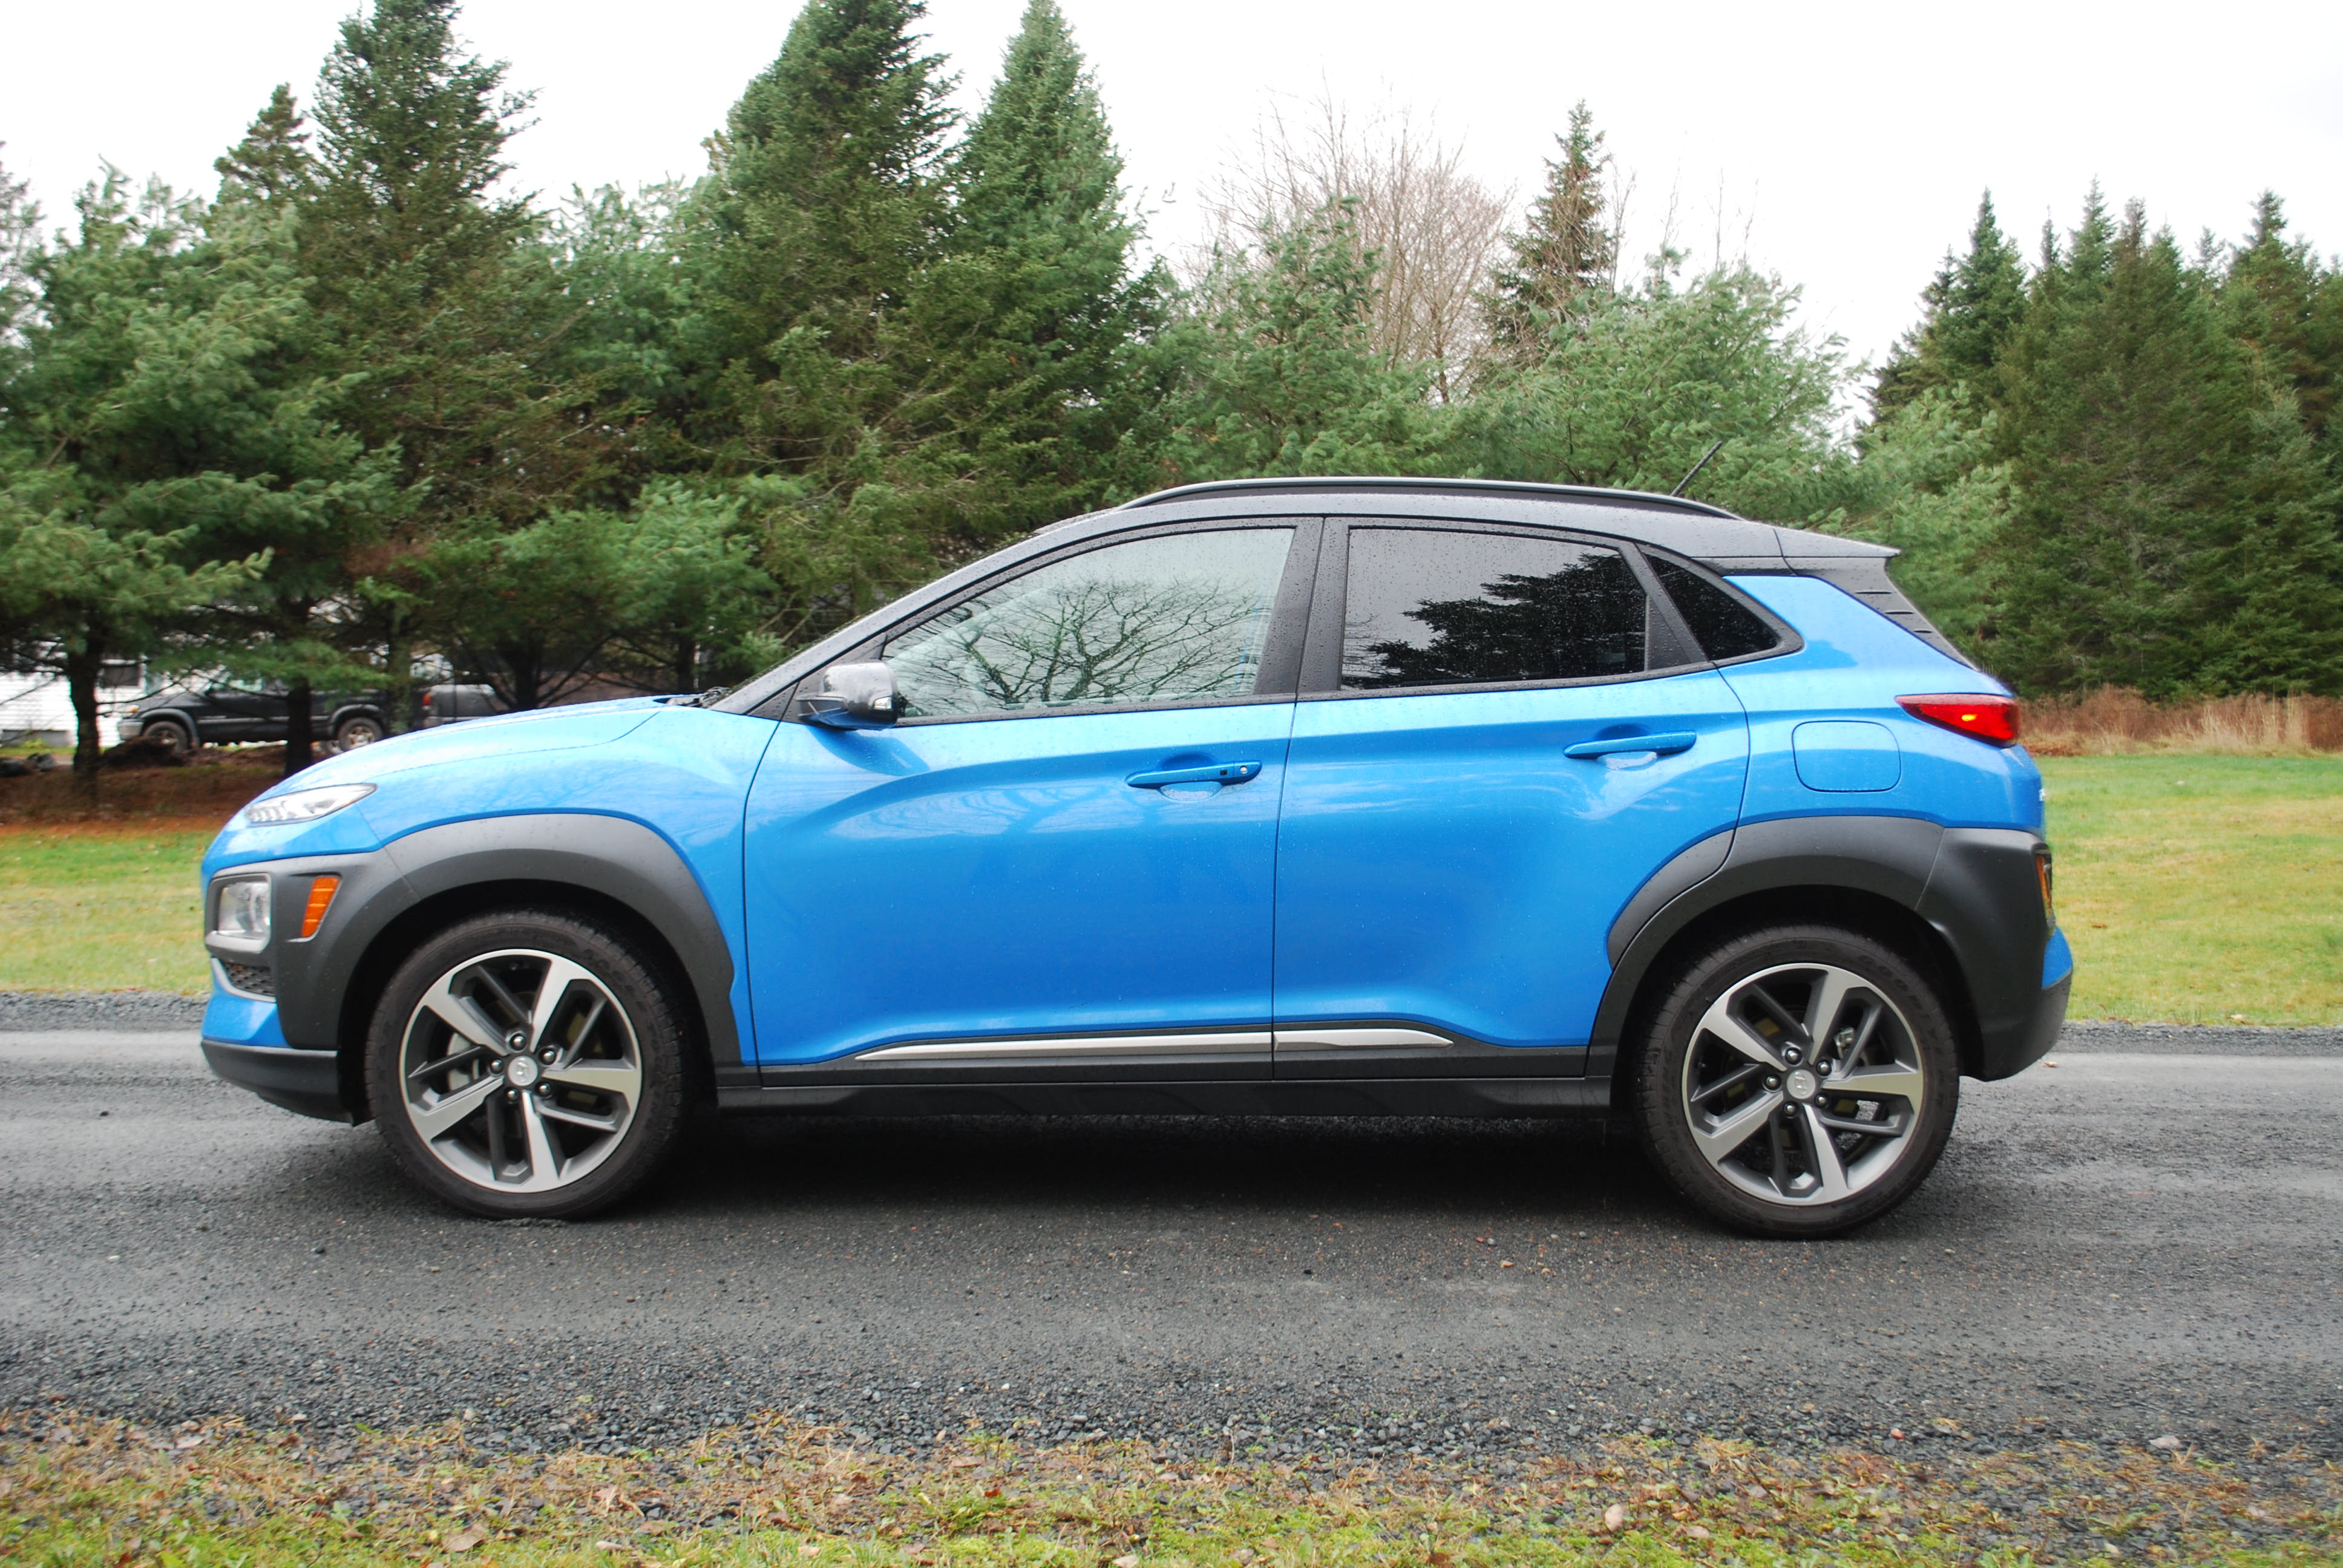 Review: 2018 Hyundai Kona